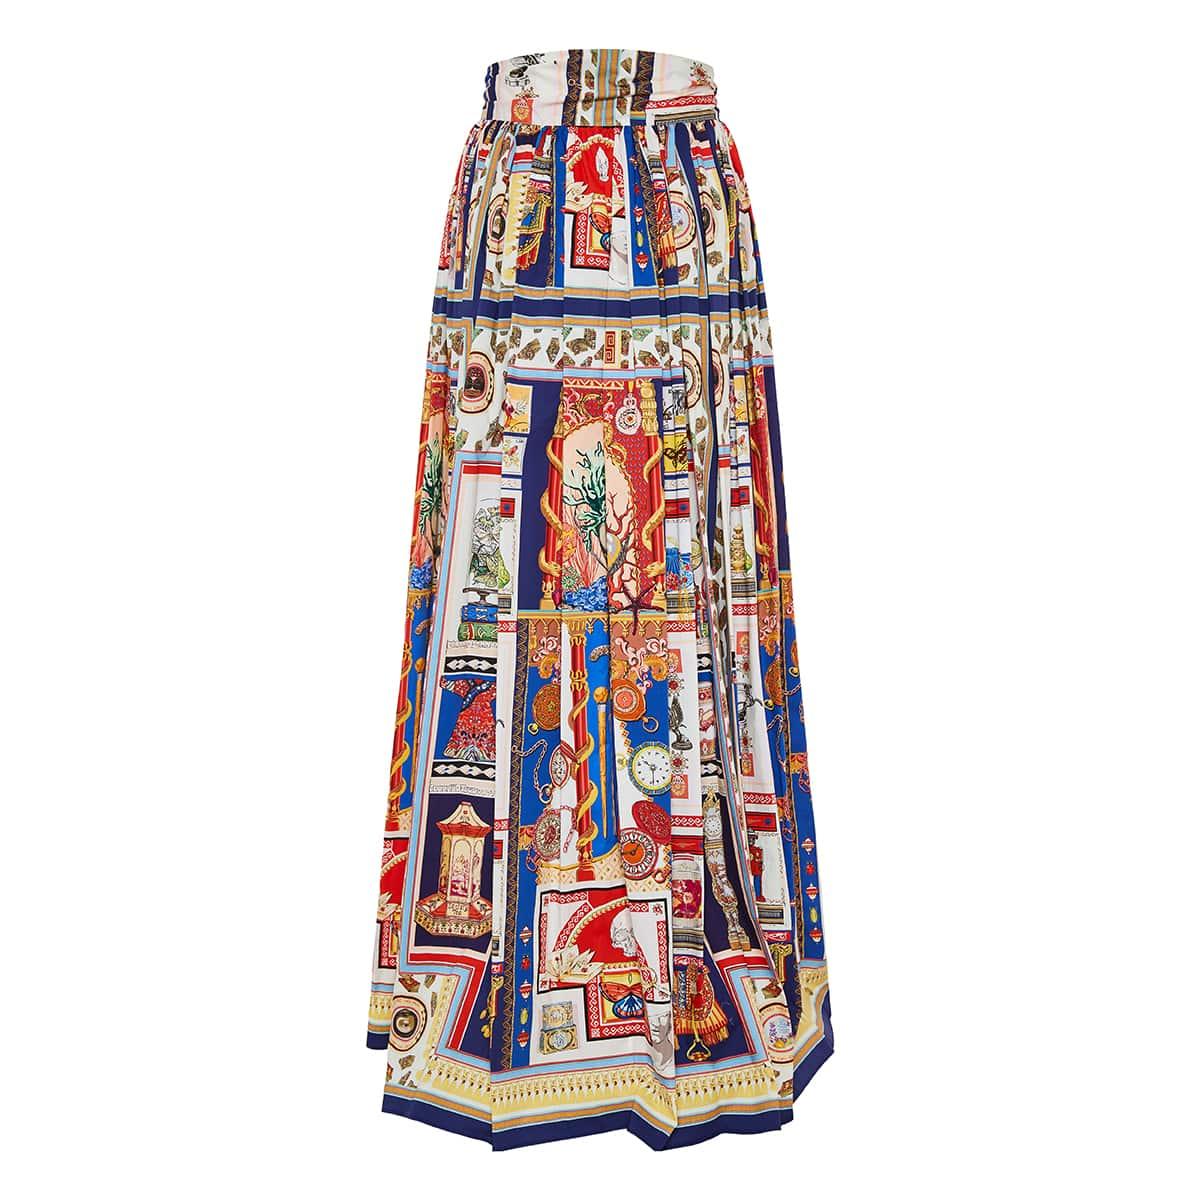 Printed pleated long skirt